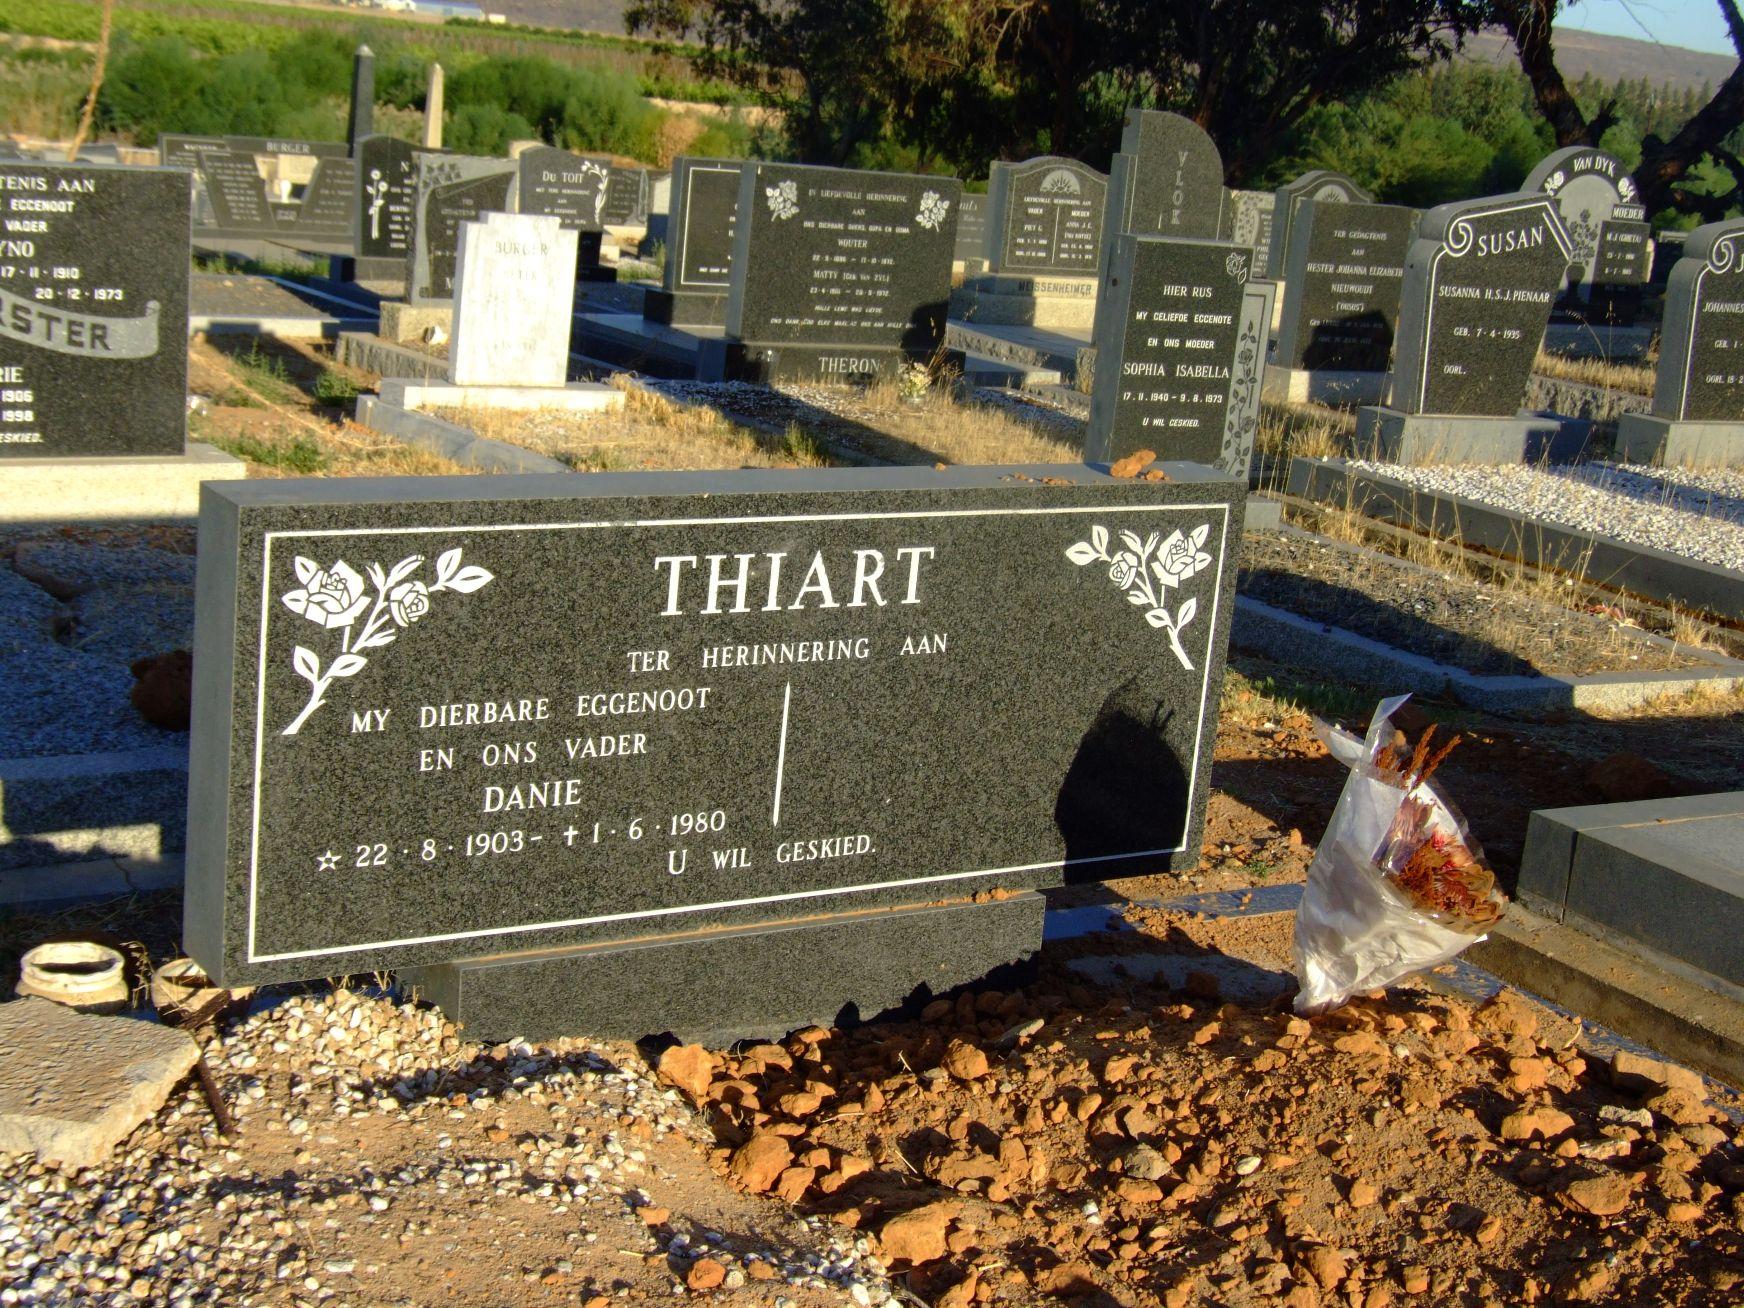 Thiart, Danie